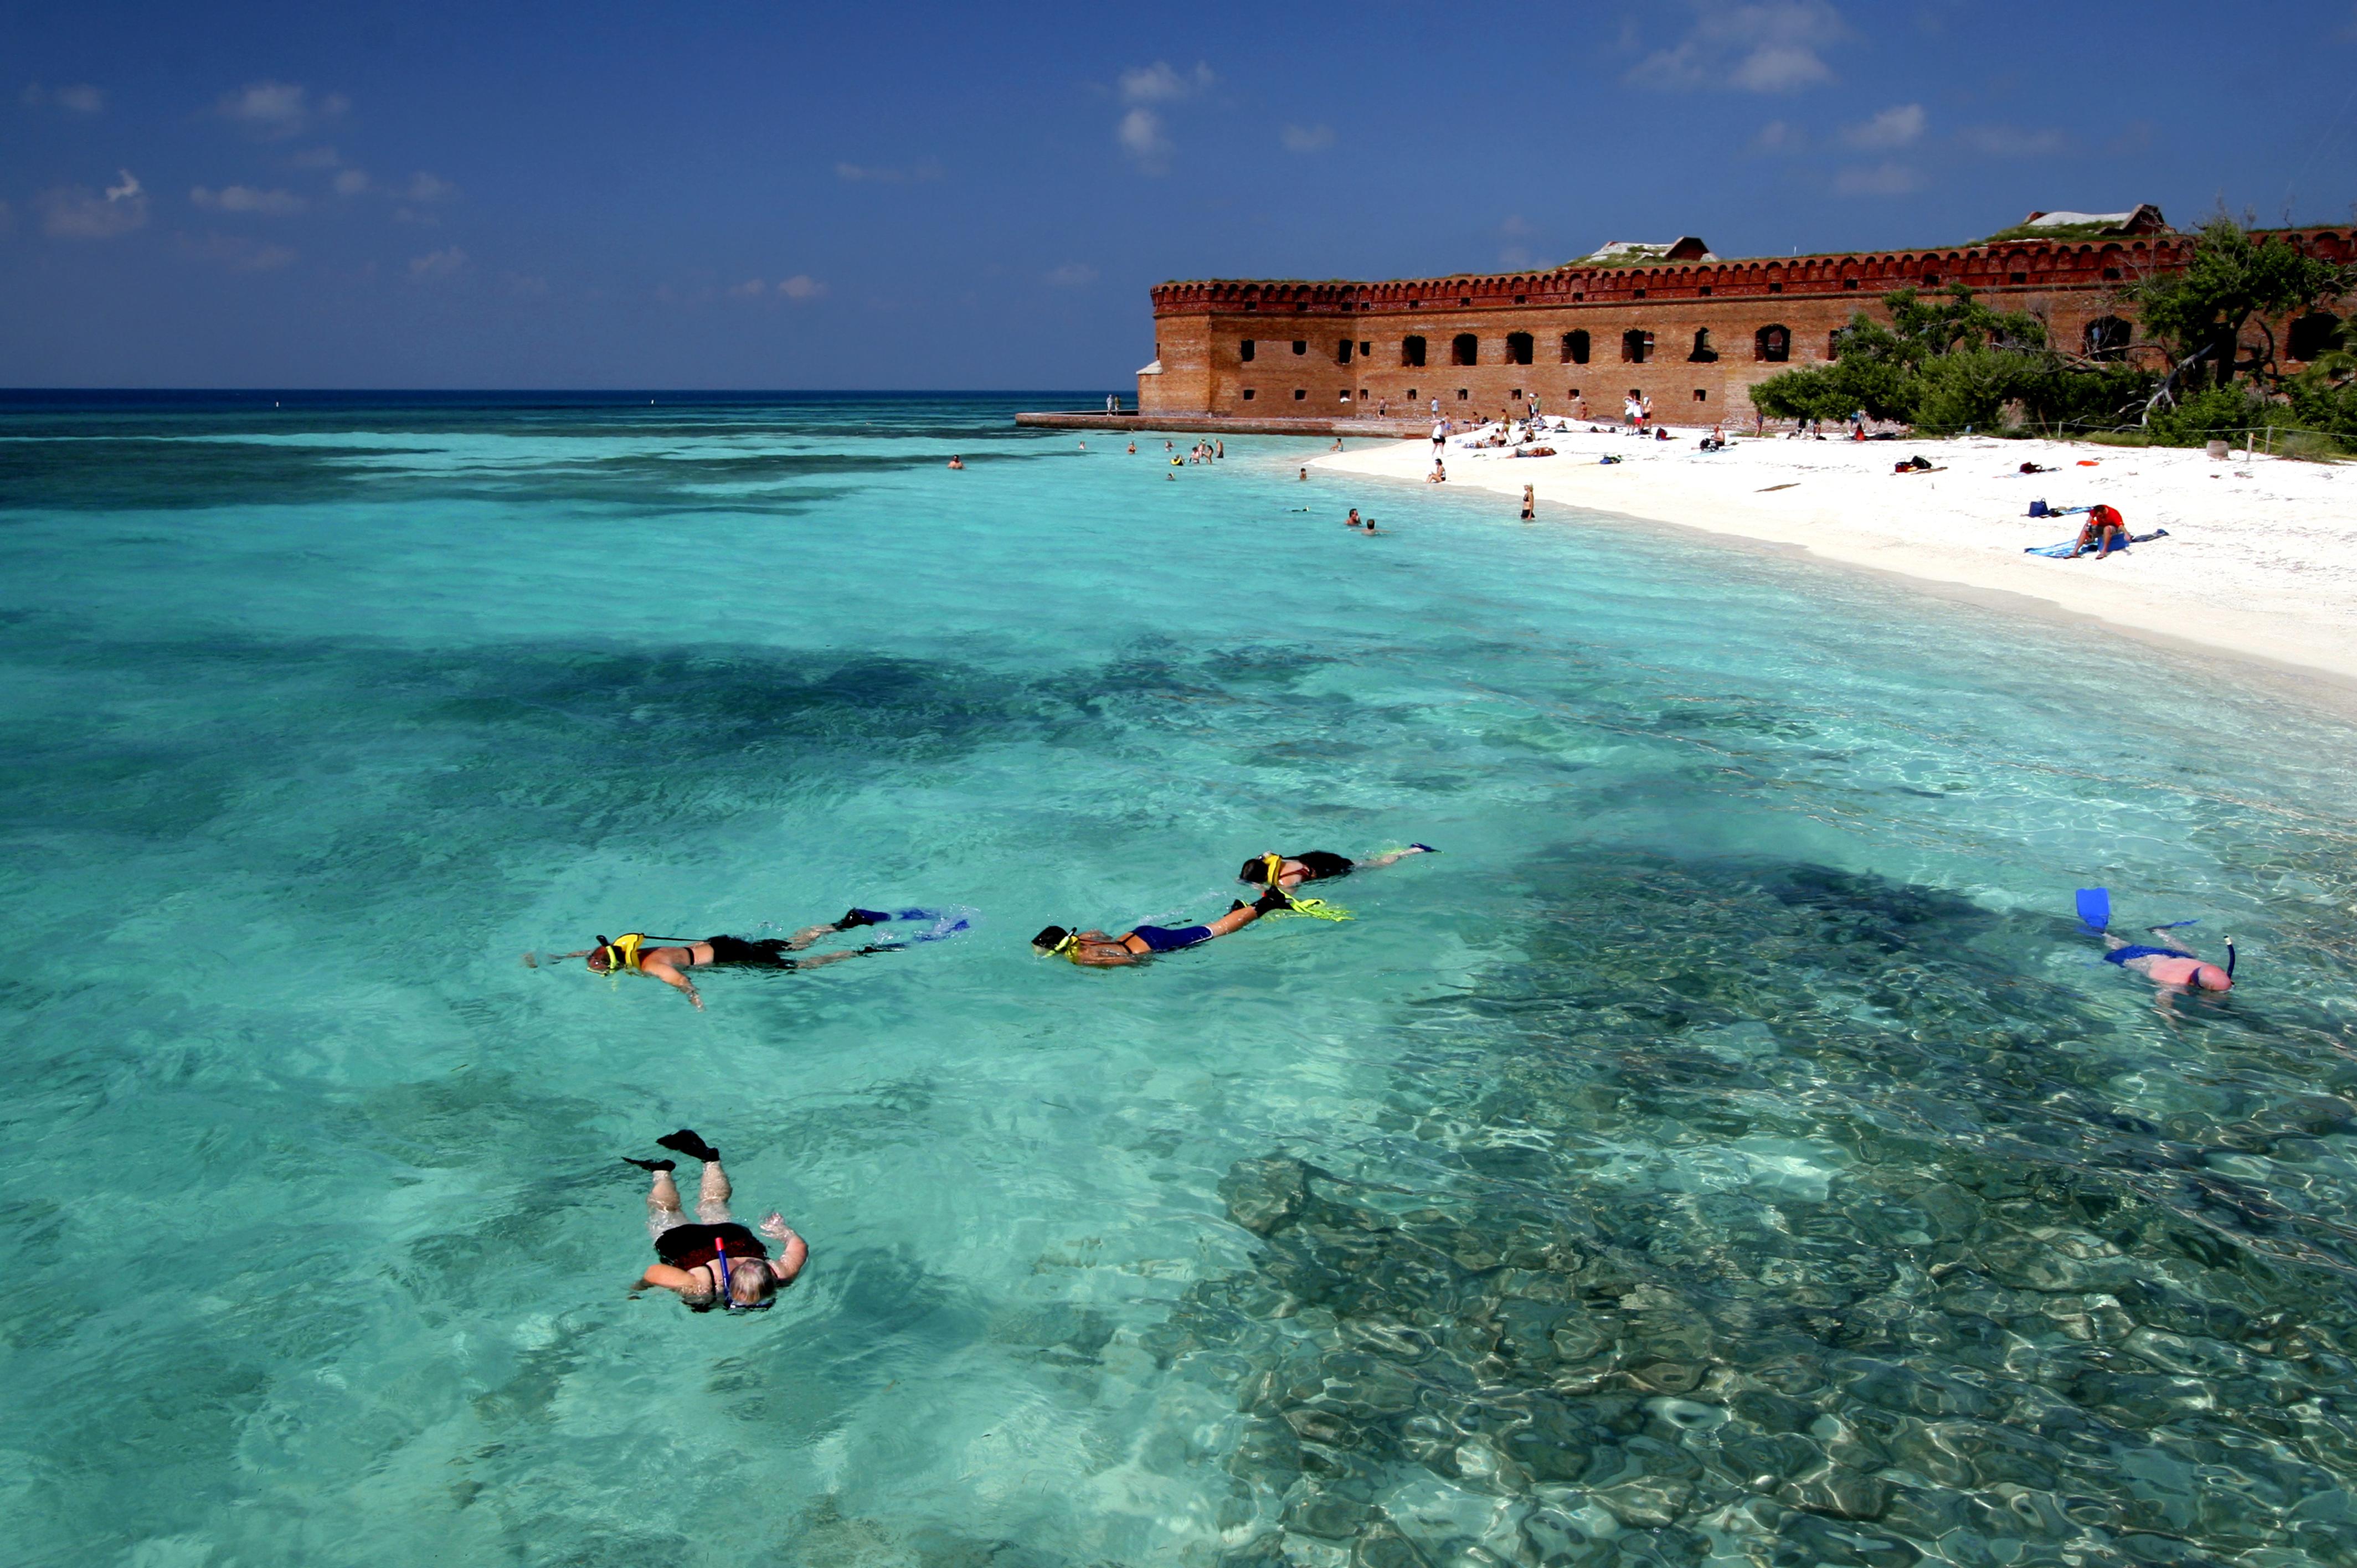 florida keys key west fort jefferson dry tortugas blue green water